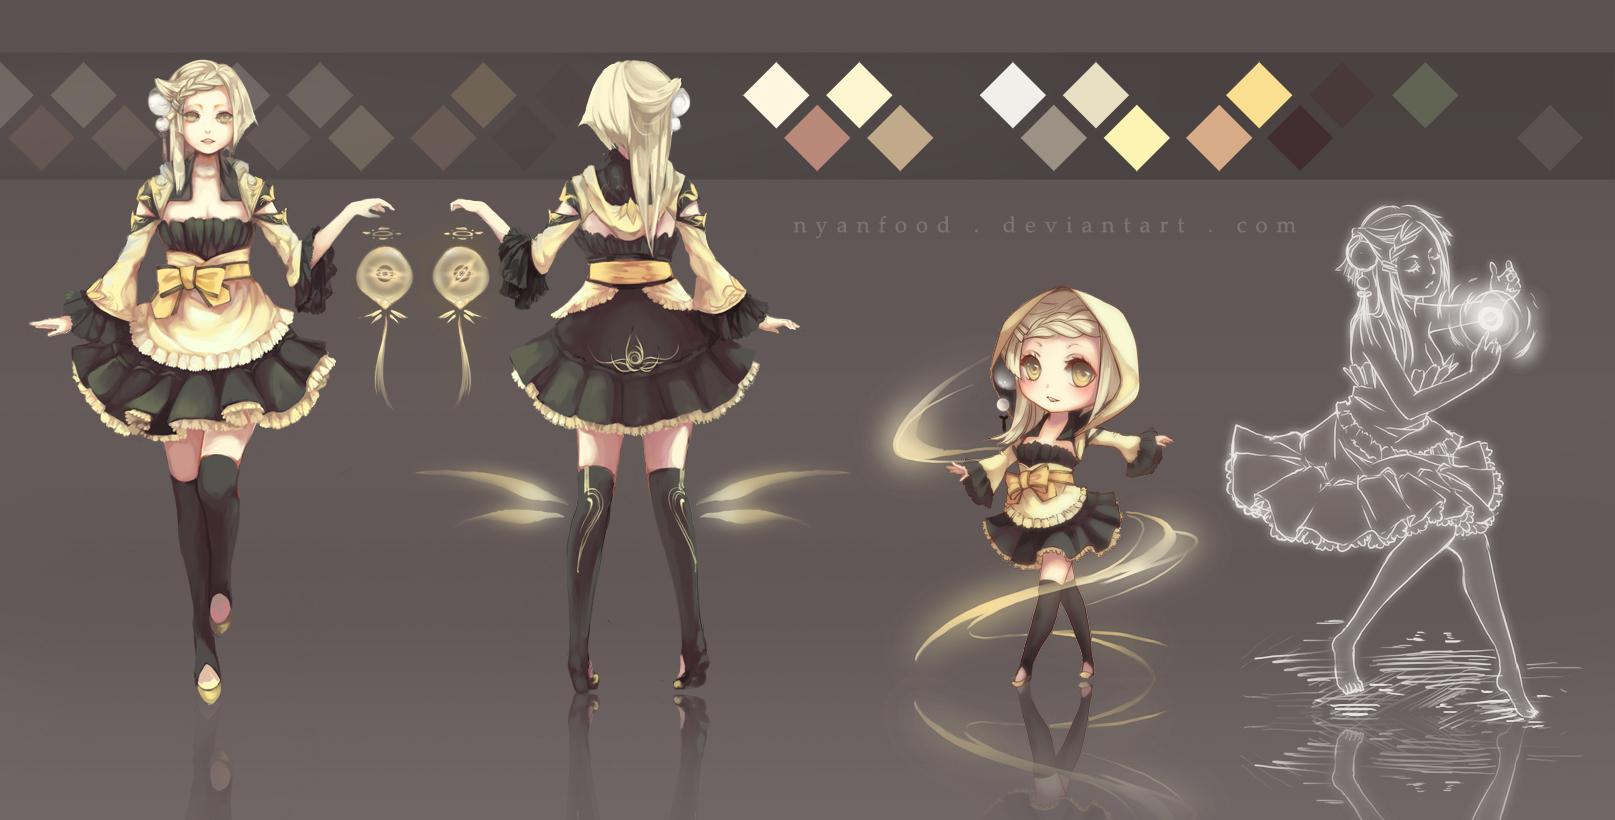 Lightbringer by Nyanfood